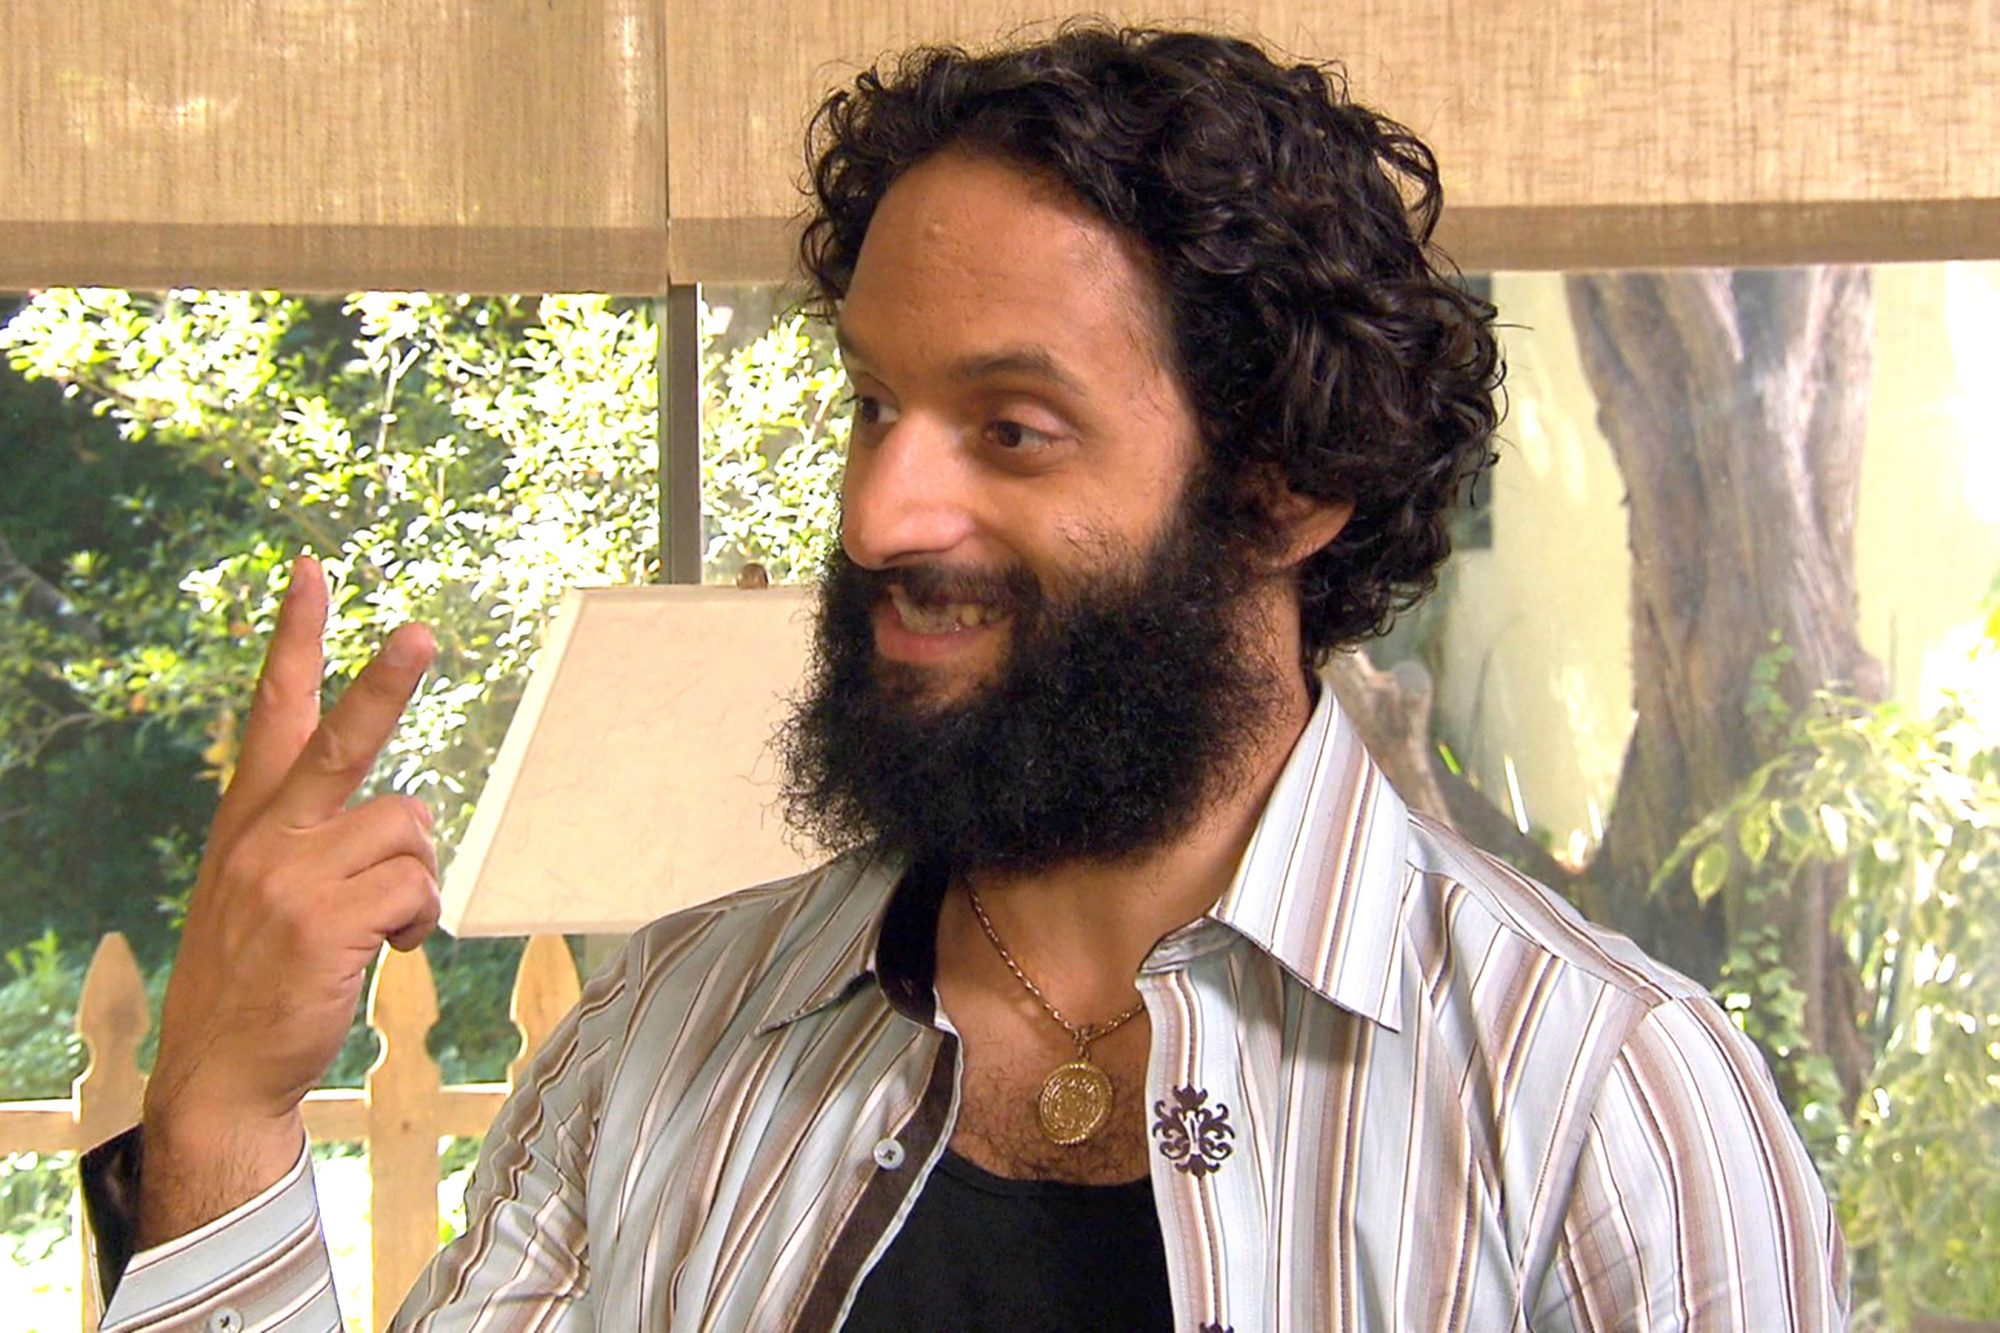 THE LEAGUE, Jason Mantzoukas in 'Ol' Smoke Crotch' (Season 3, Episode 4, aired October 27, 2011), 20